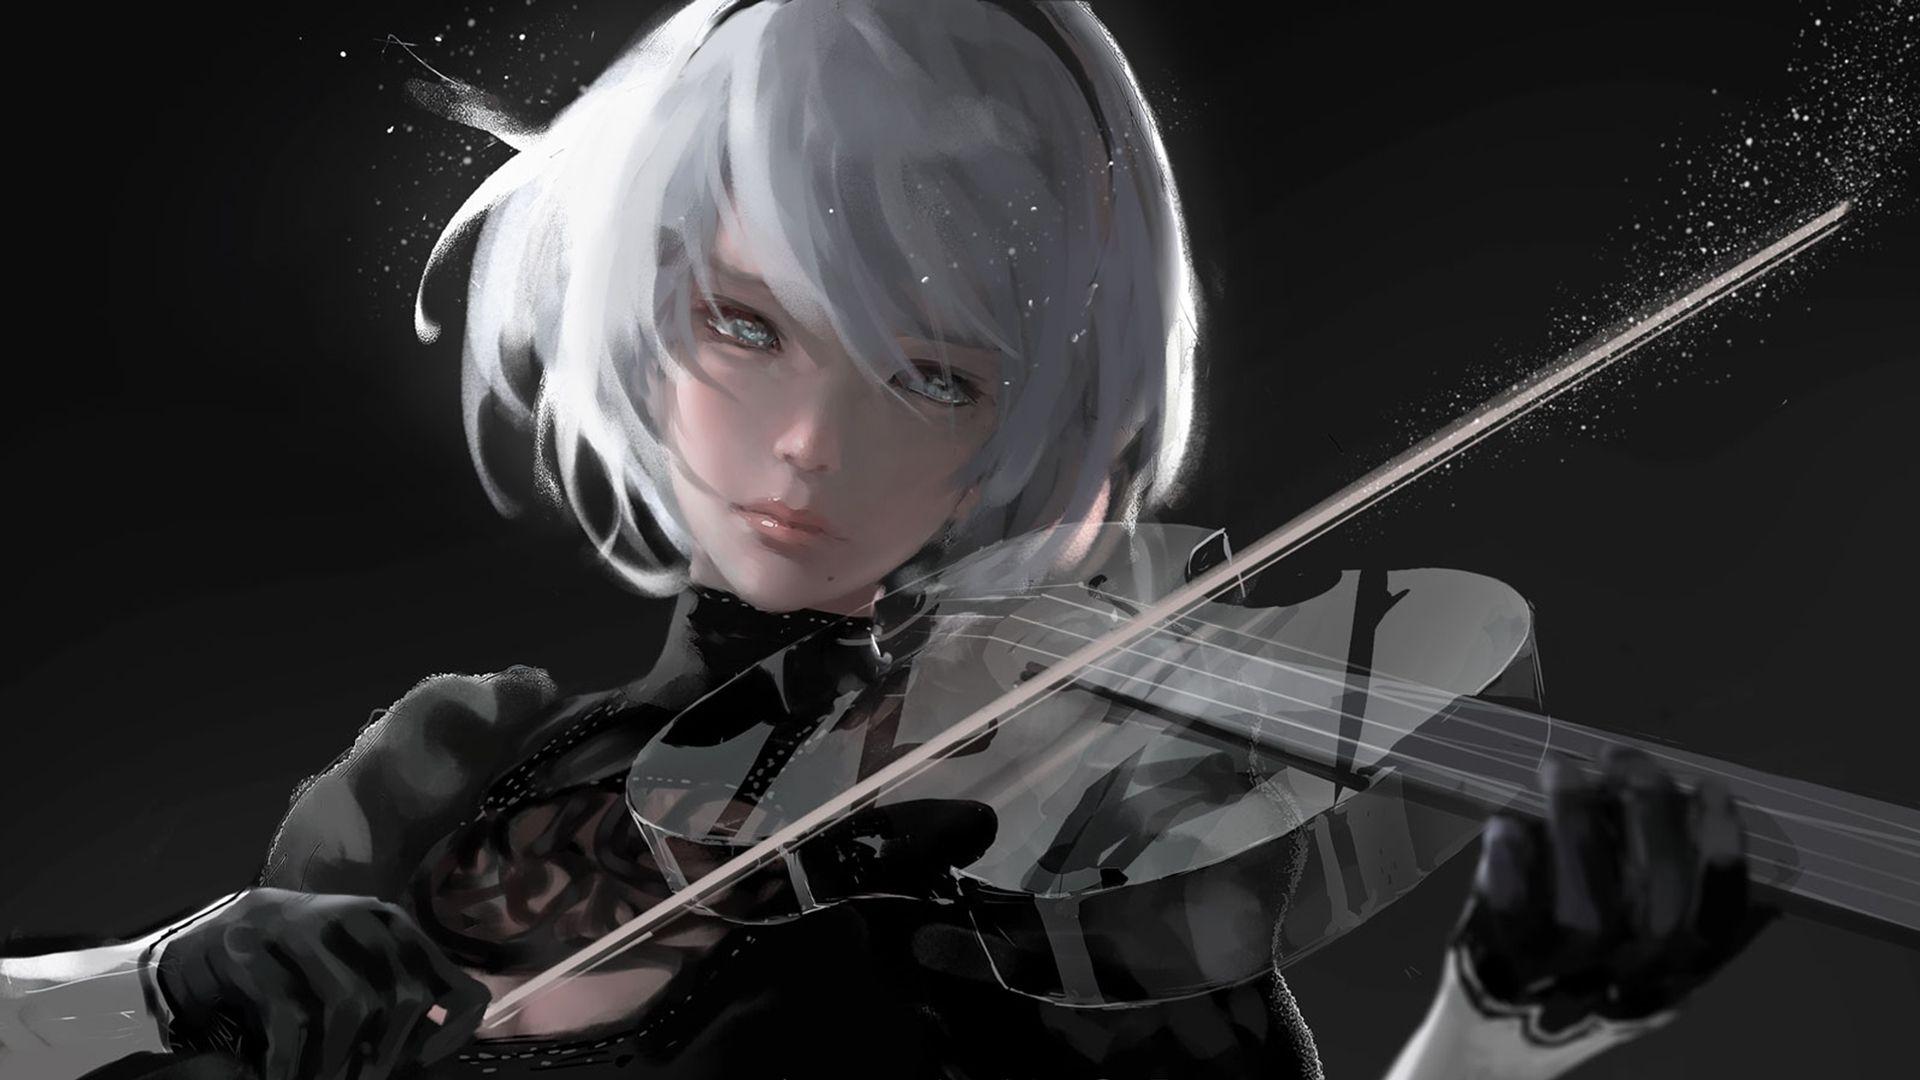 Wallpaper Geek Girl Hd 2b Playing Violin Nier Automata Inspiration